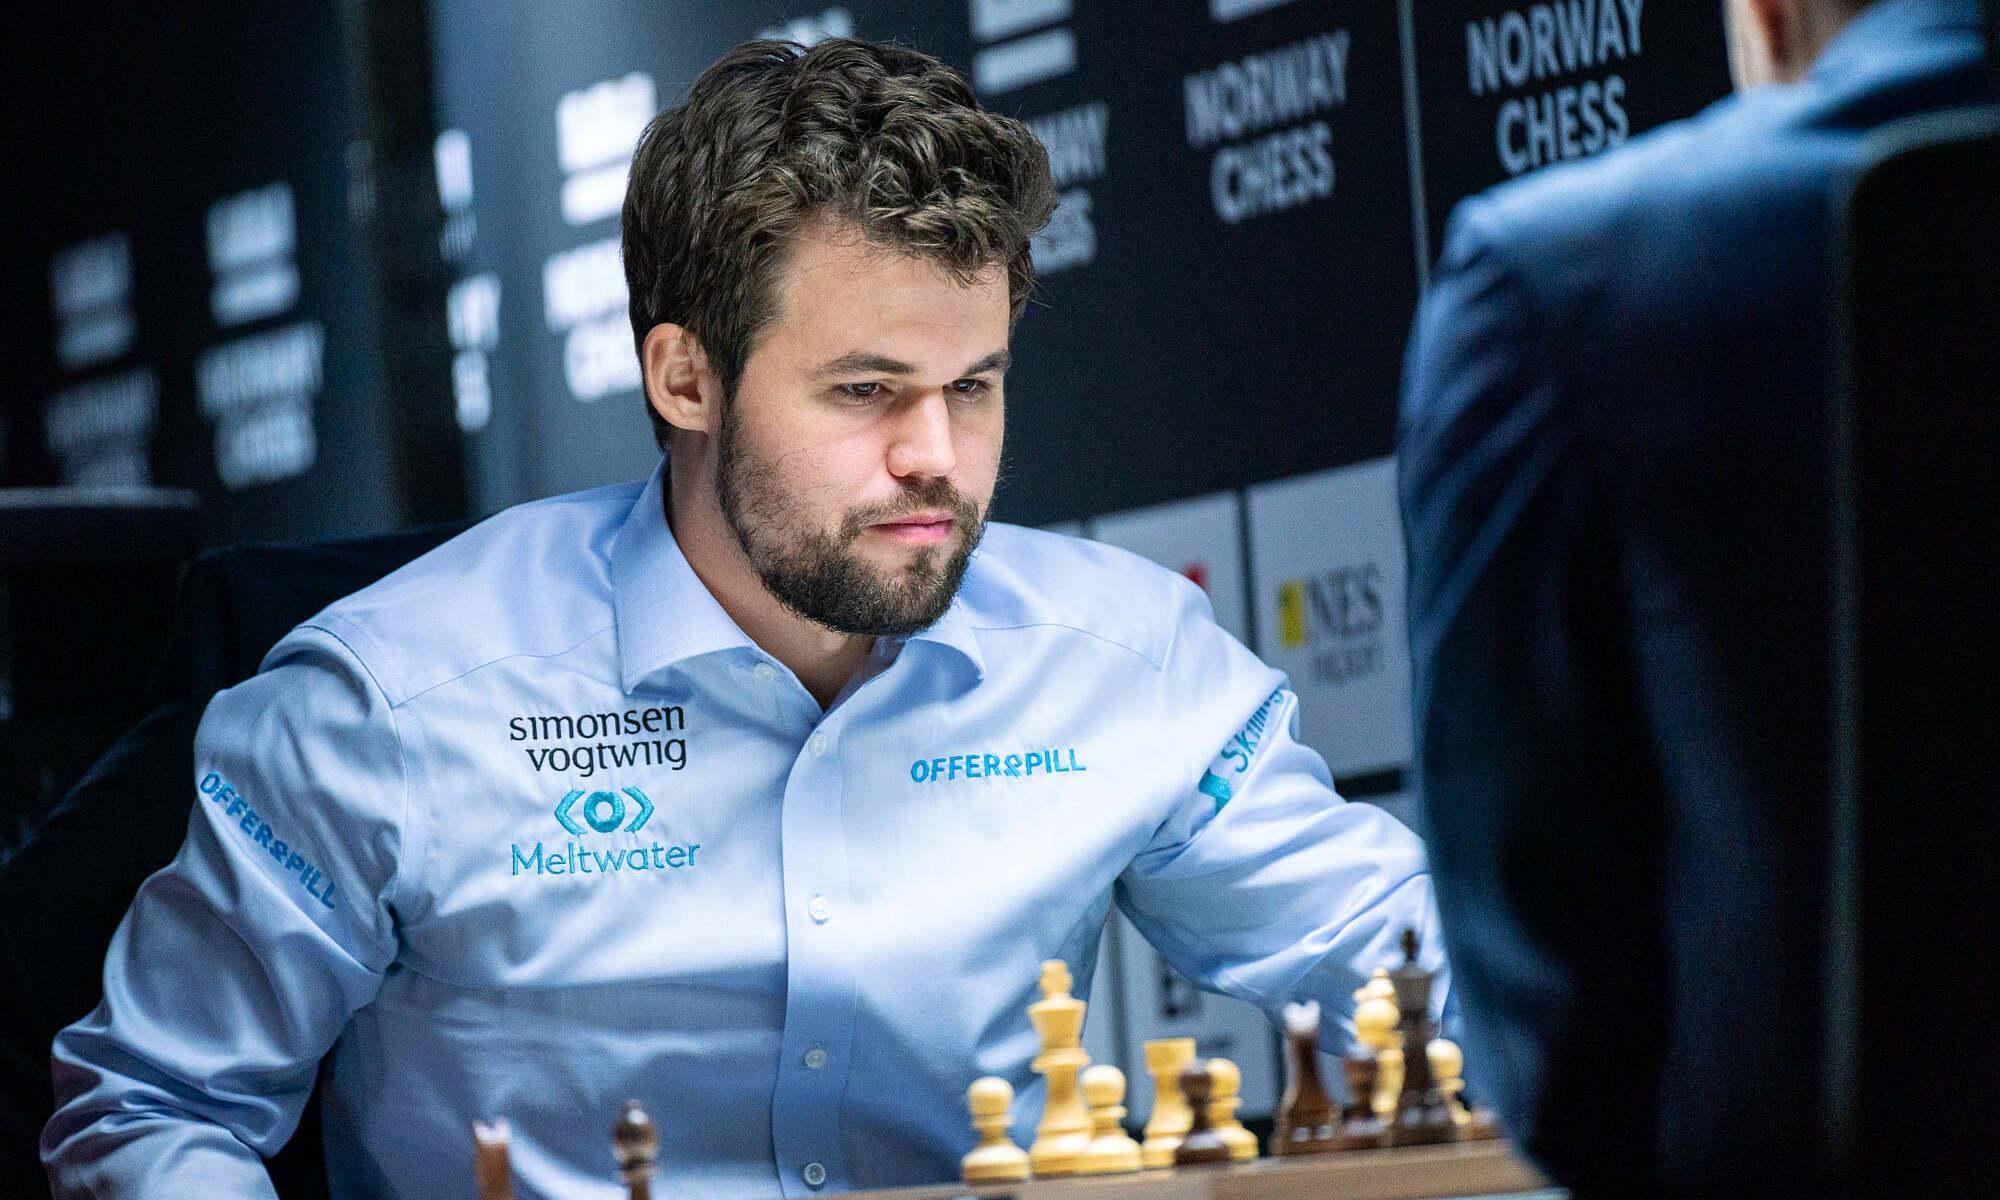 Carlsen trong ván thắng Karjakin tối 16/9. Ảnh: Norway Chess/Lennart Ootes